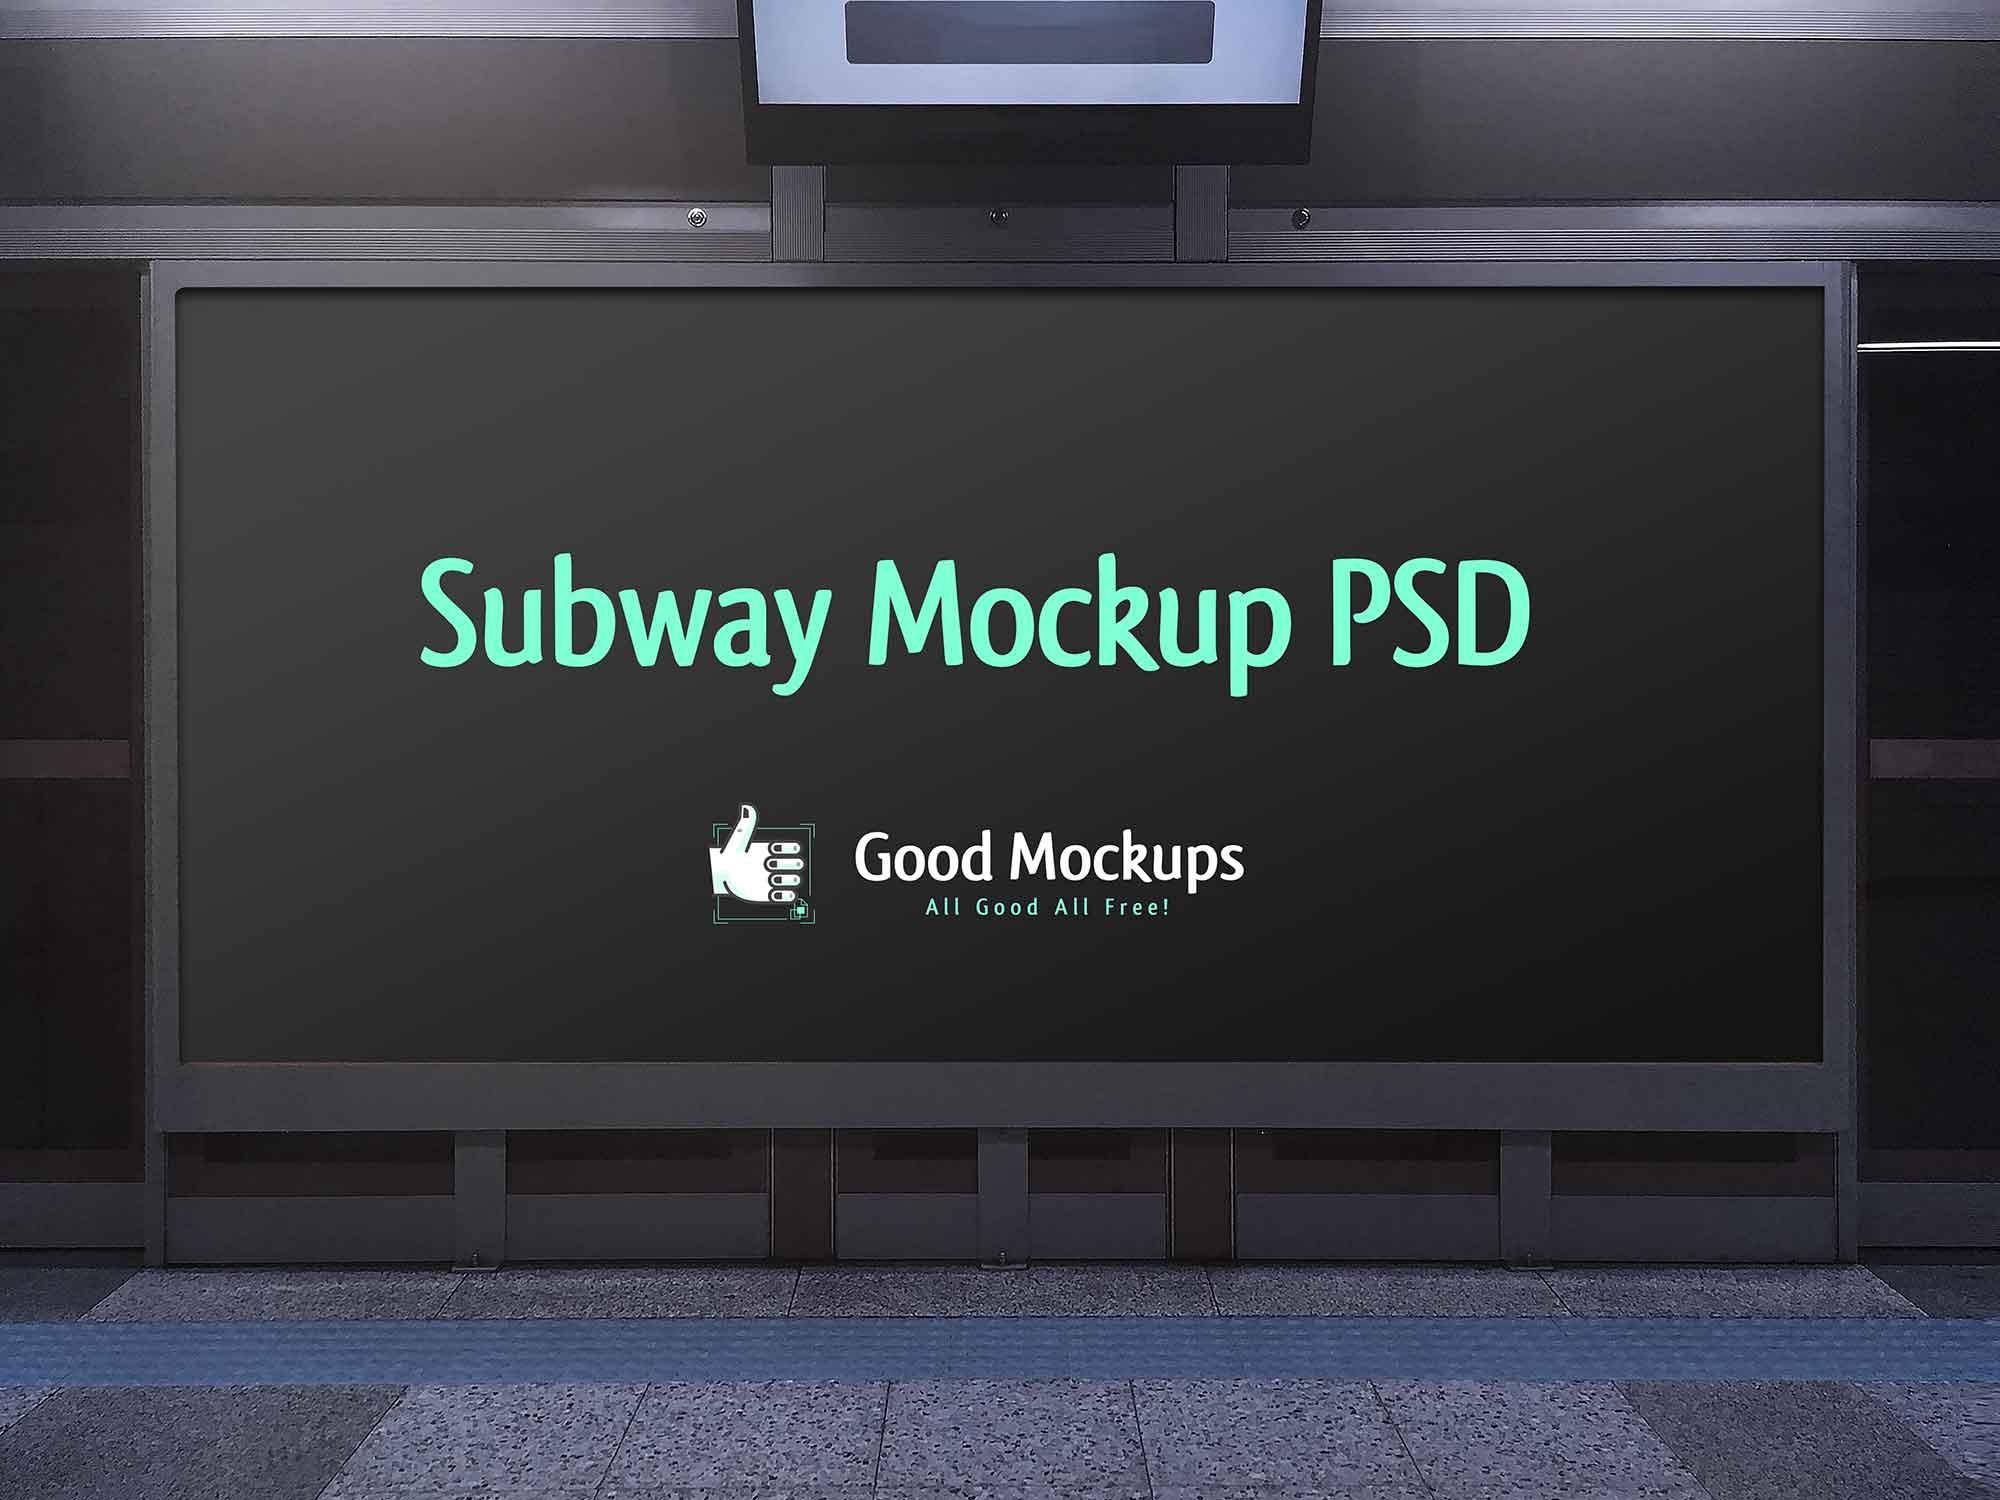 Advertising Subway Hoarding Mockup